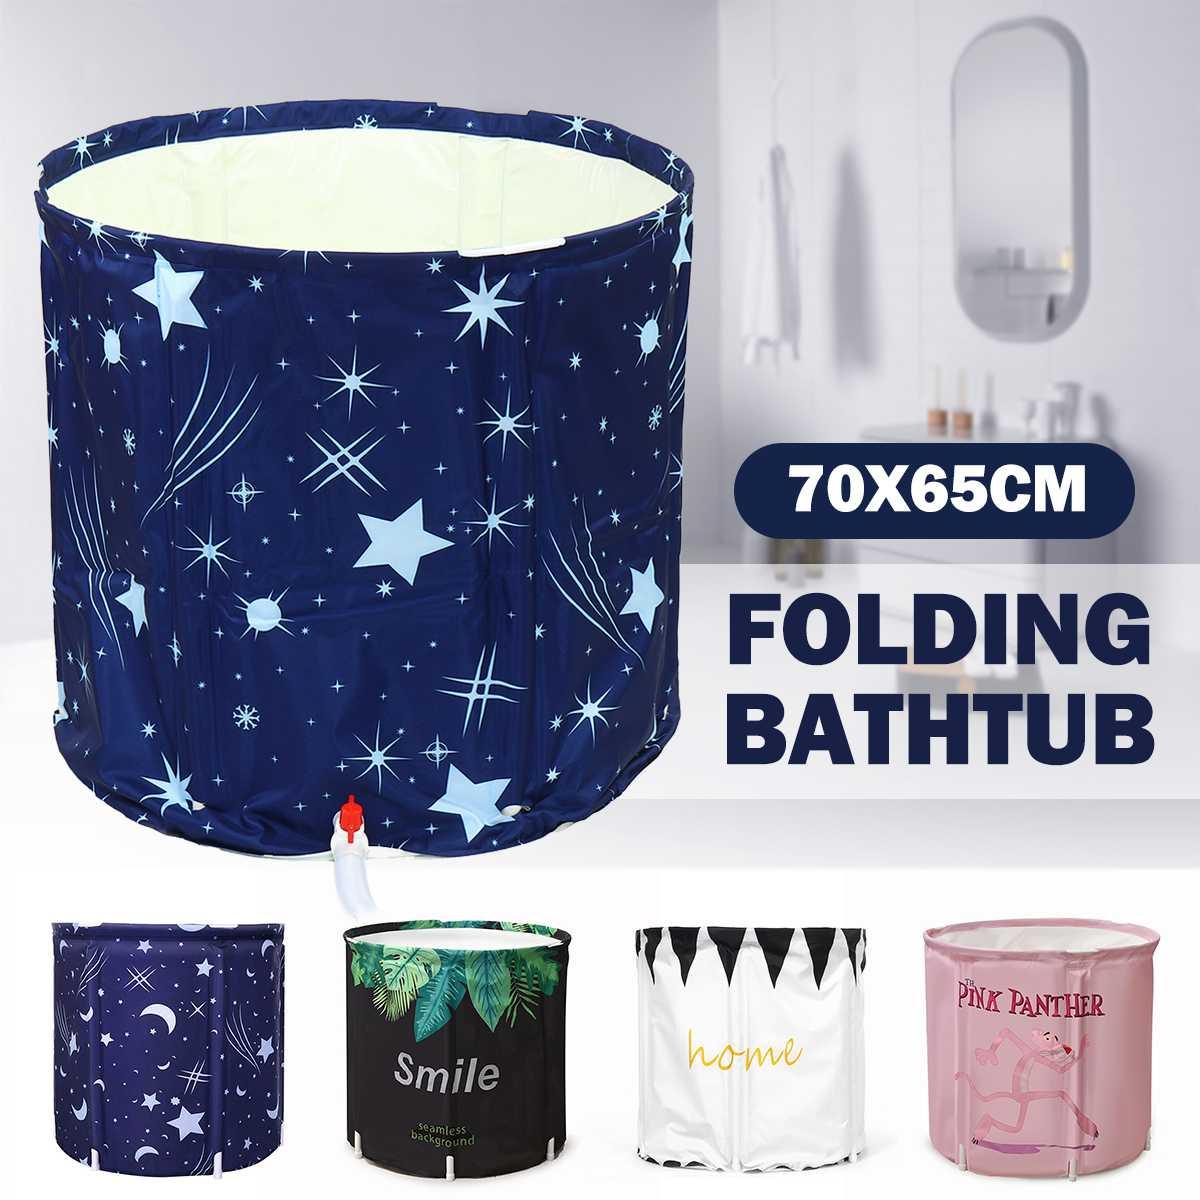 1pcs Foldable Bathtub High quality Thickened Adult Inflatable Bathtub Home Single SPA Massage Pool Plastic Bathing Bucket